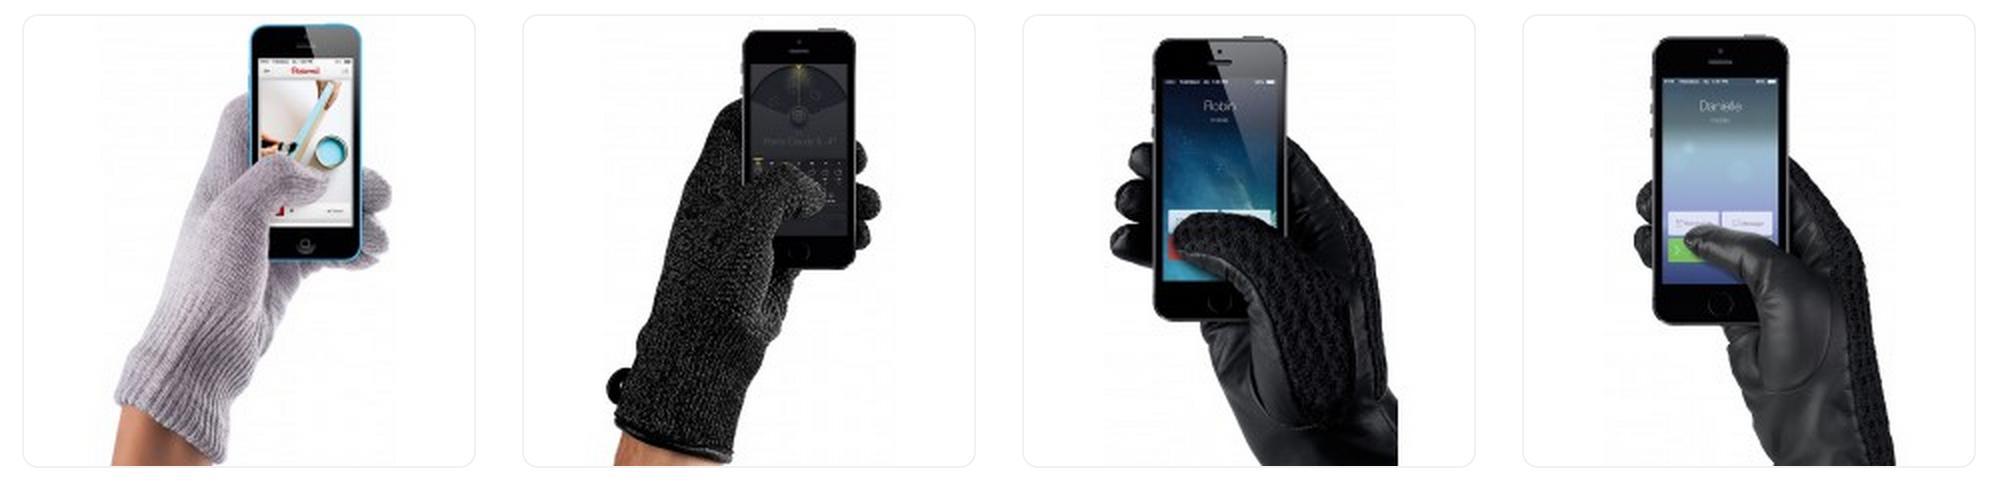 Mujjo-touchscreen-glove